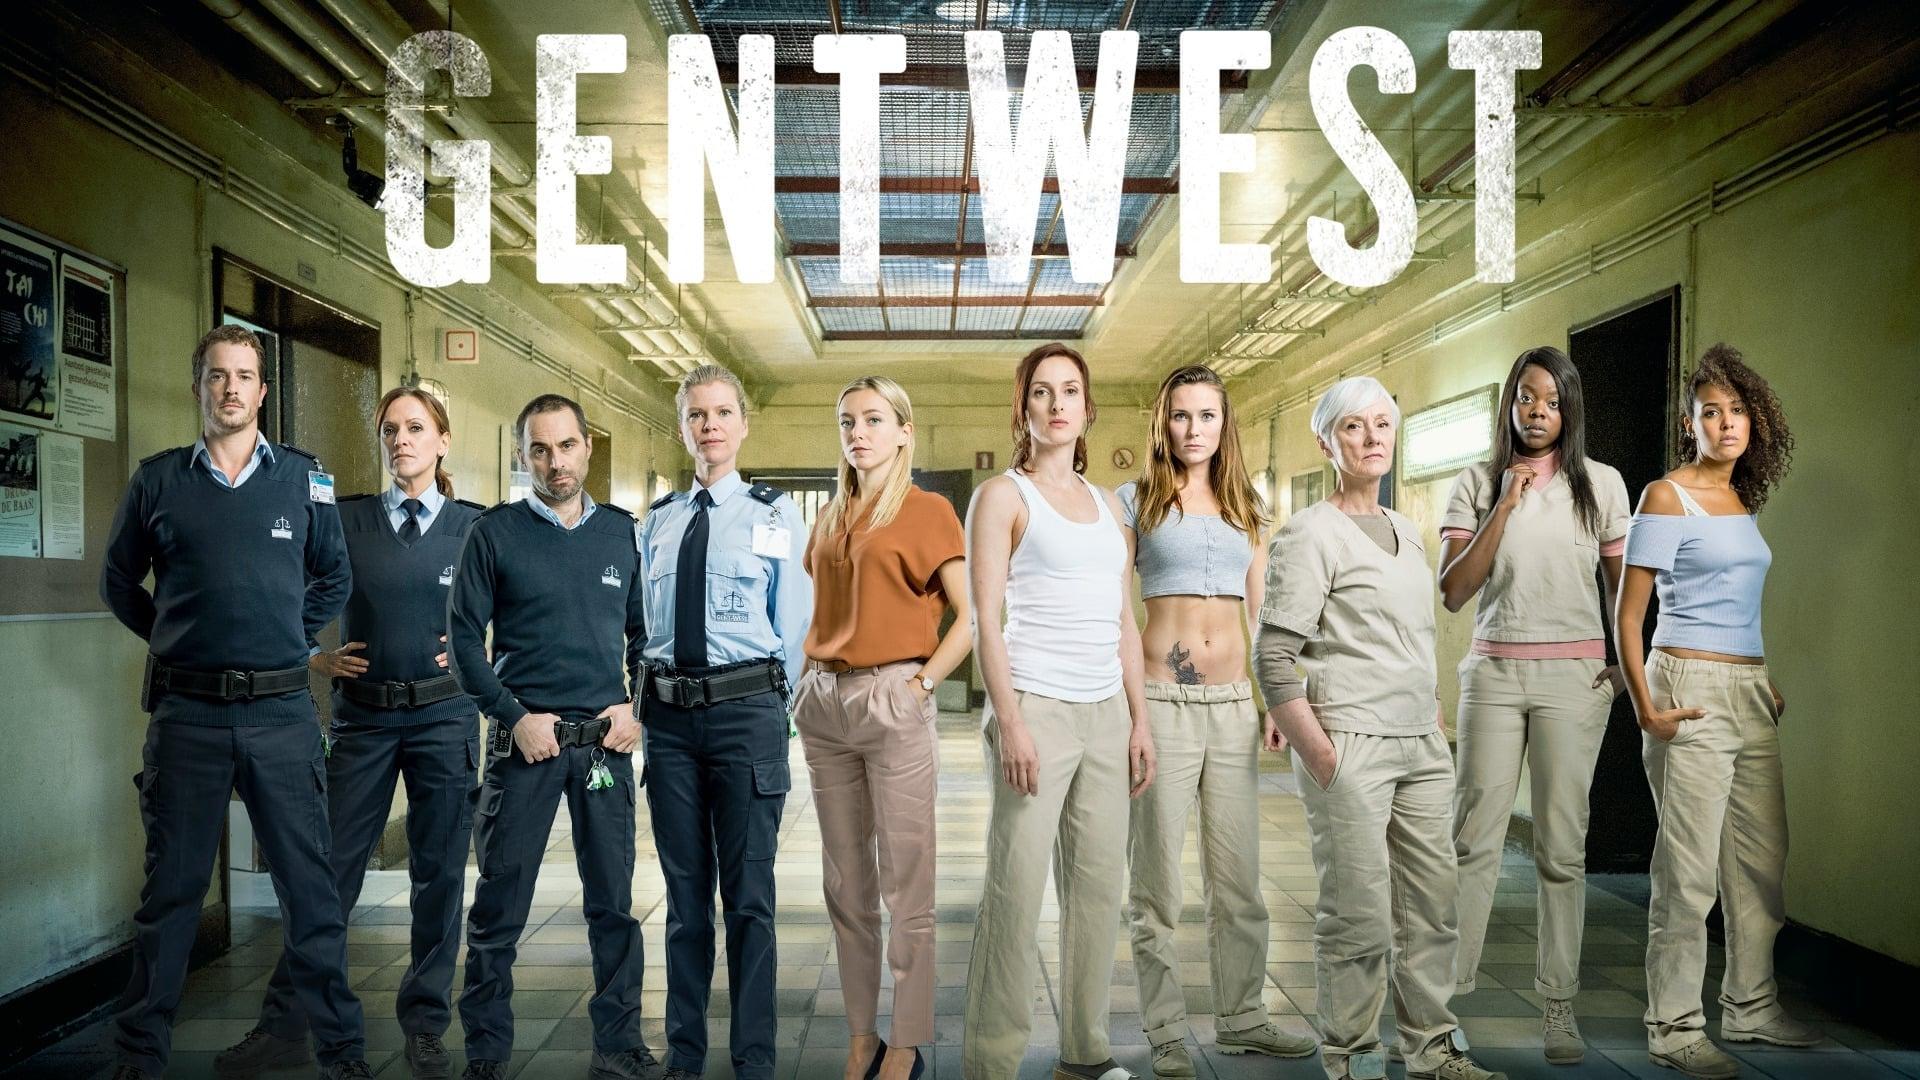 Gent West - Seizoen 2